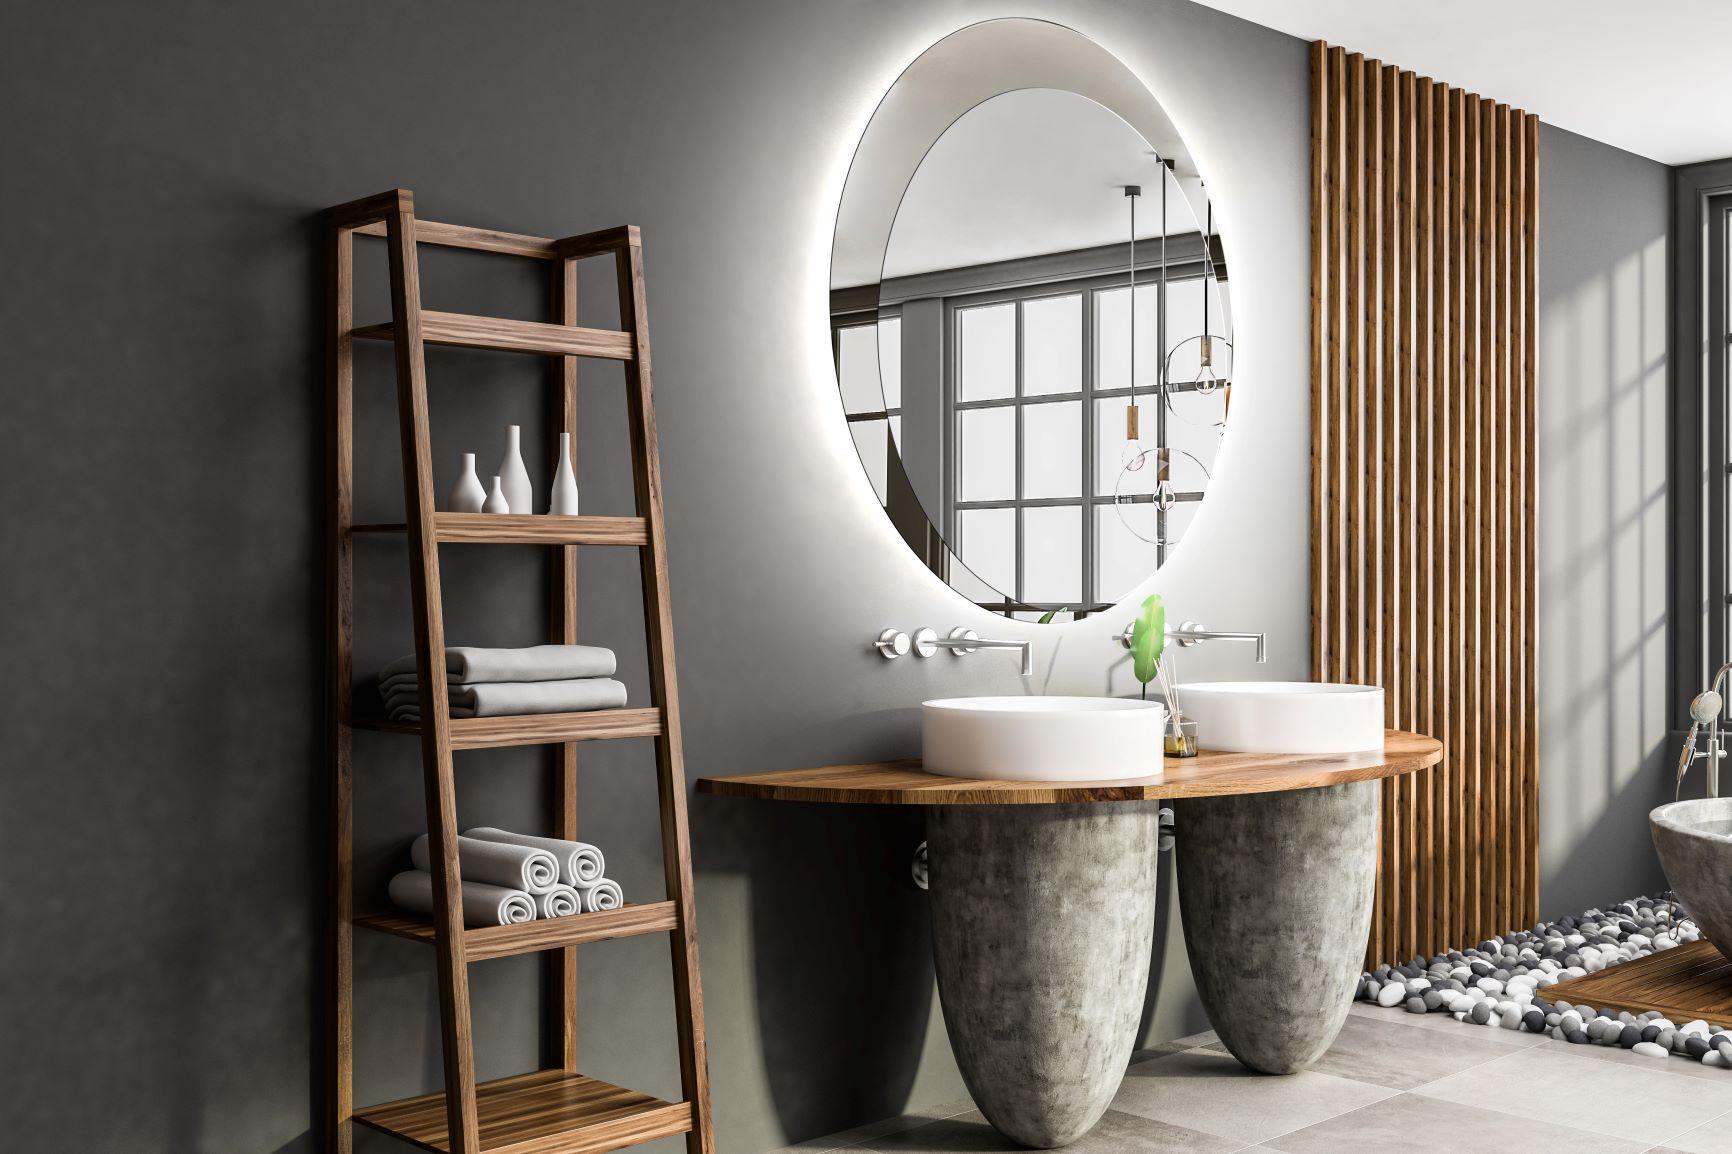 https://von-adelberg.com/wp-content/uploads/2021/03/Silver-selena-LED-mirror.jpg